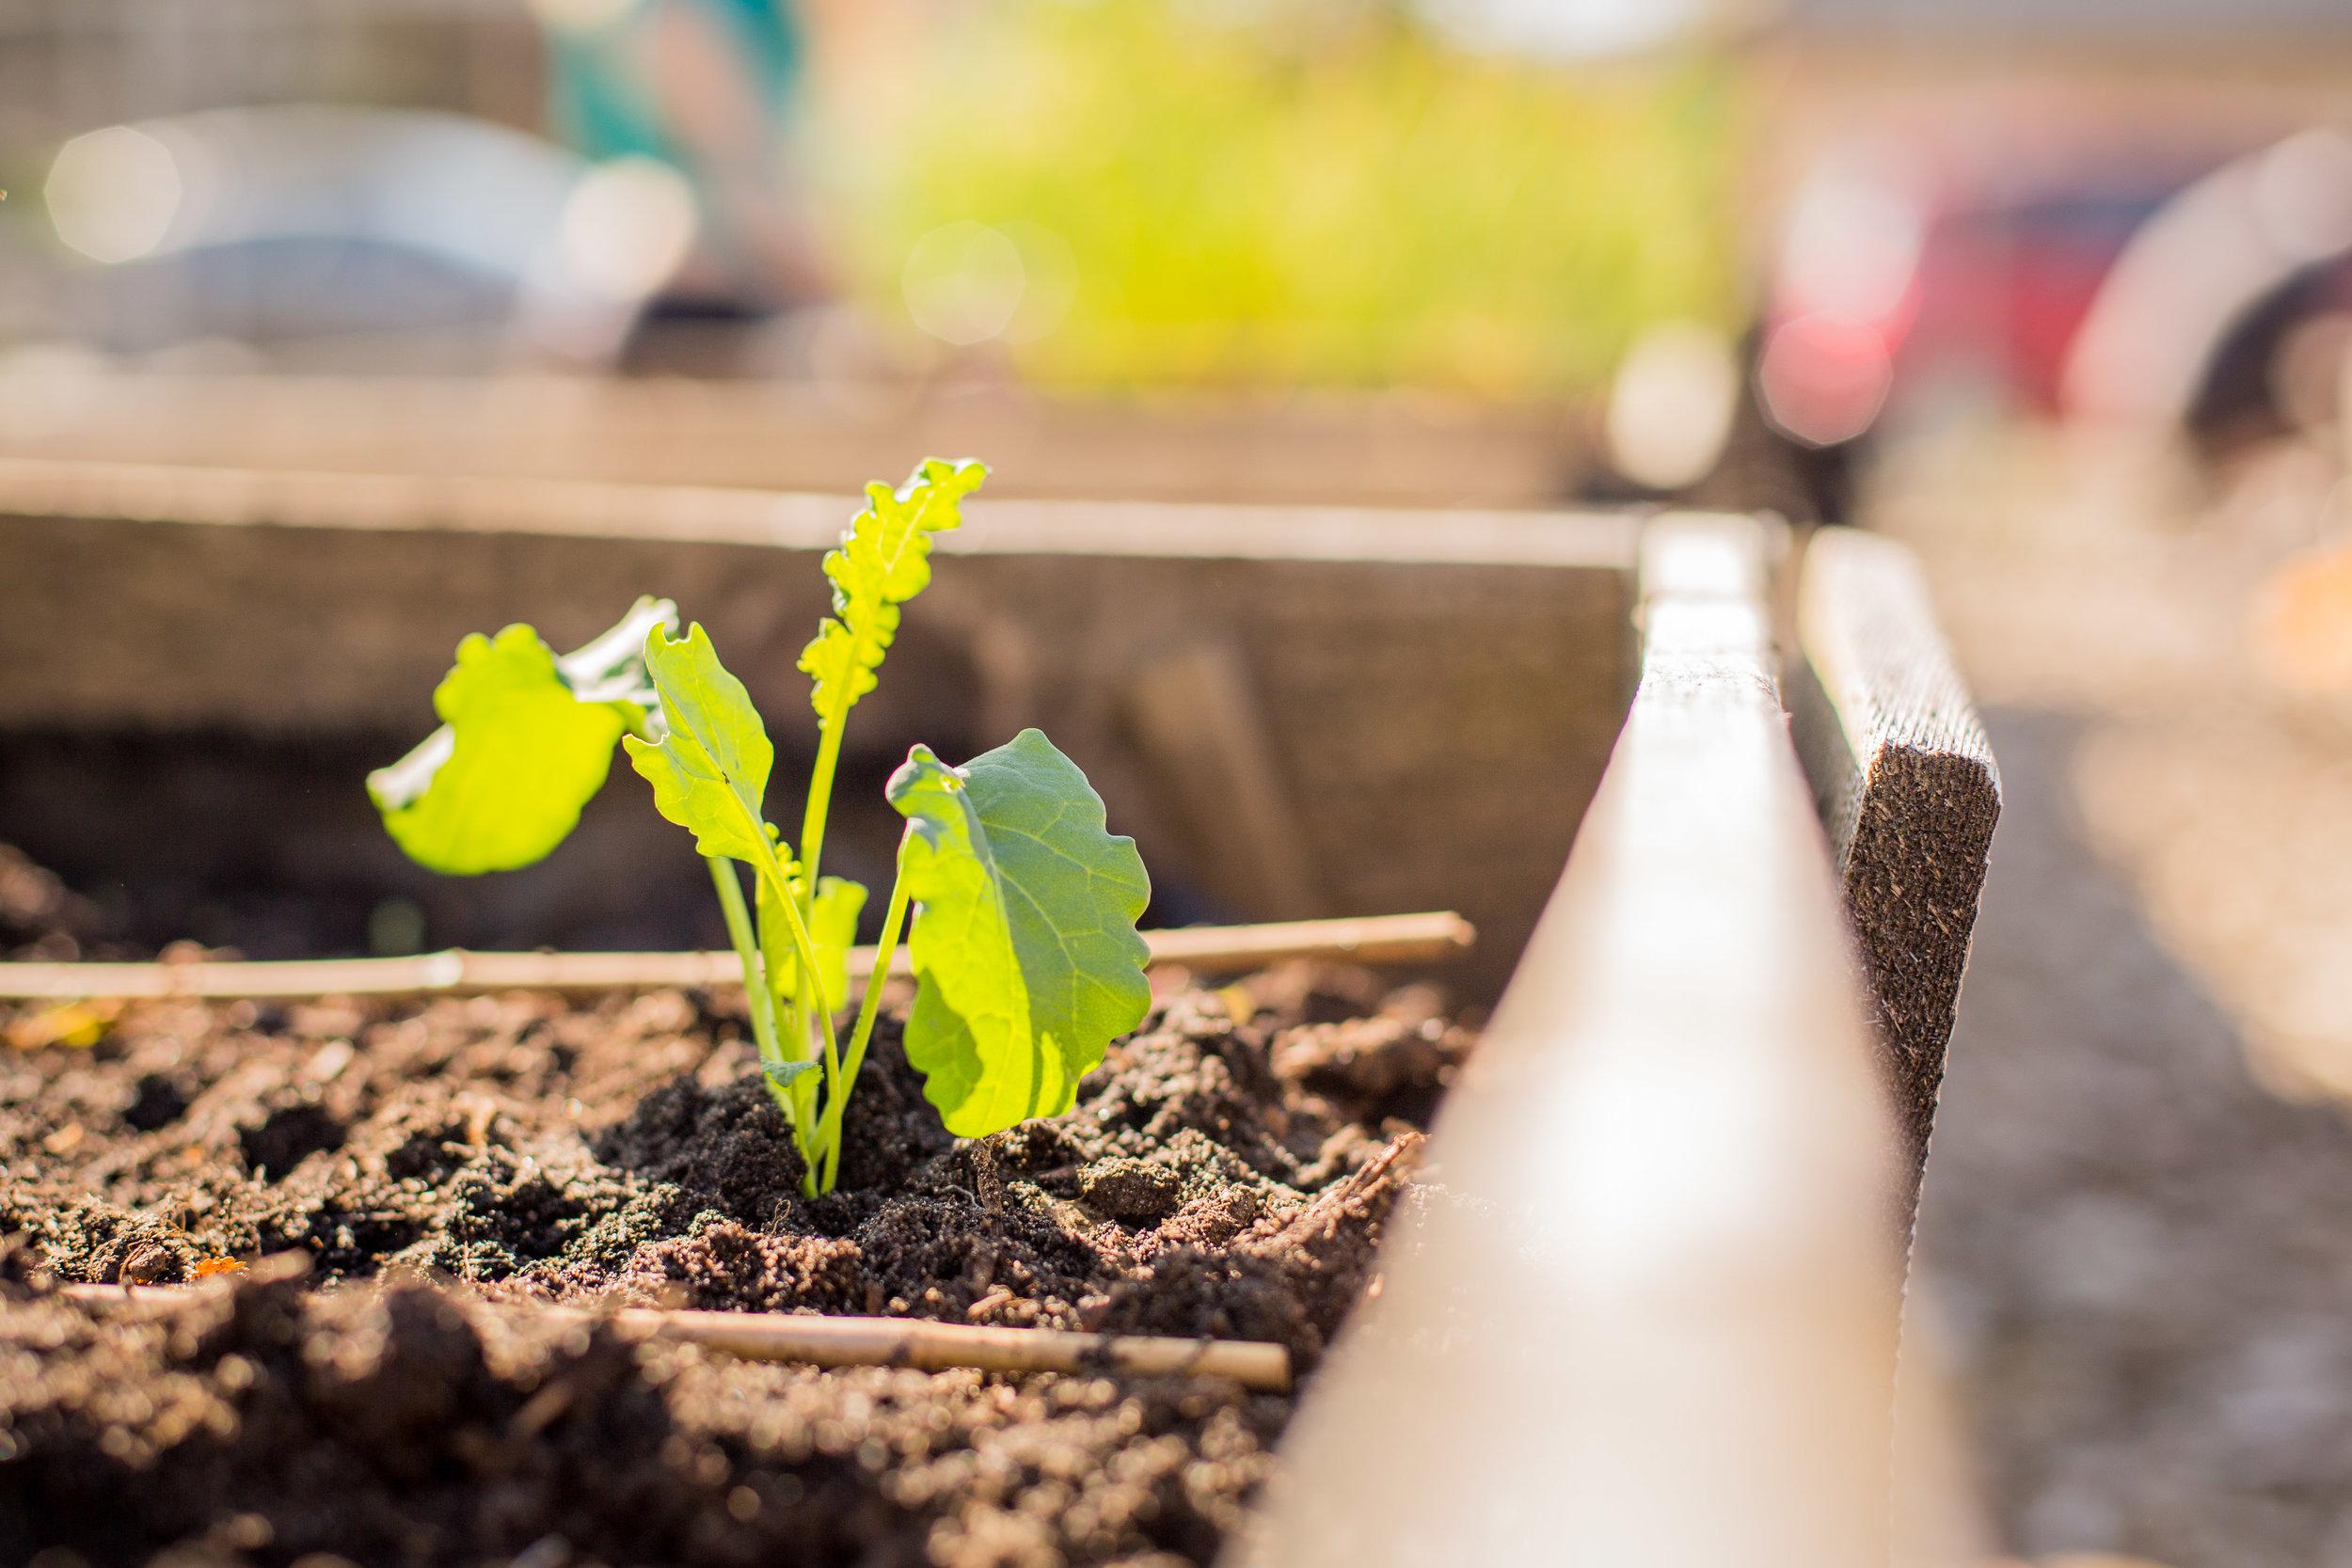 Raised_Garden_Bed_The_Drive_Temporary_Community_Garden_04.2016_Shifting_Growth_026.jpg